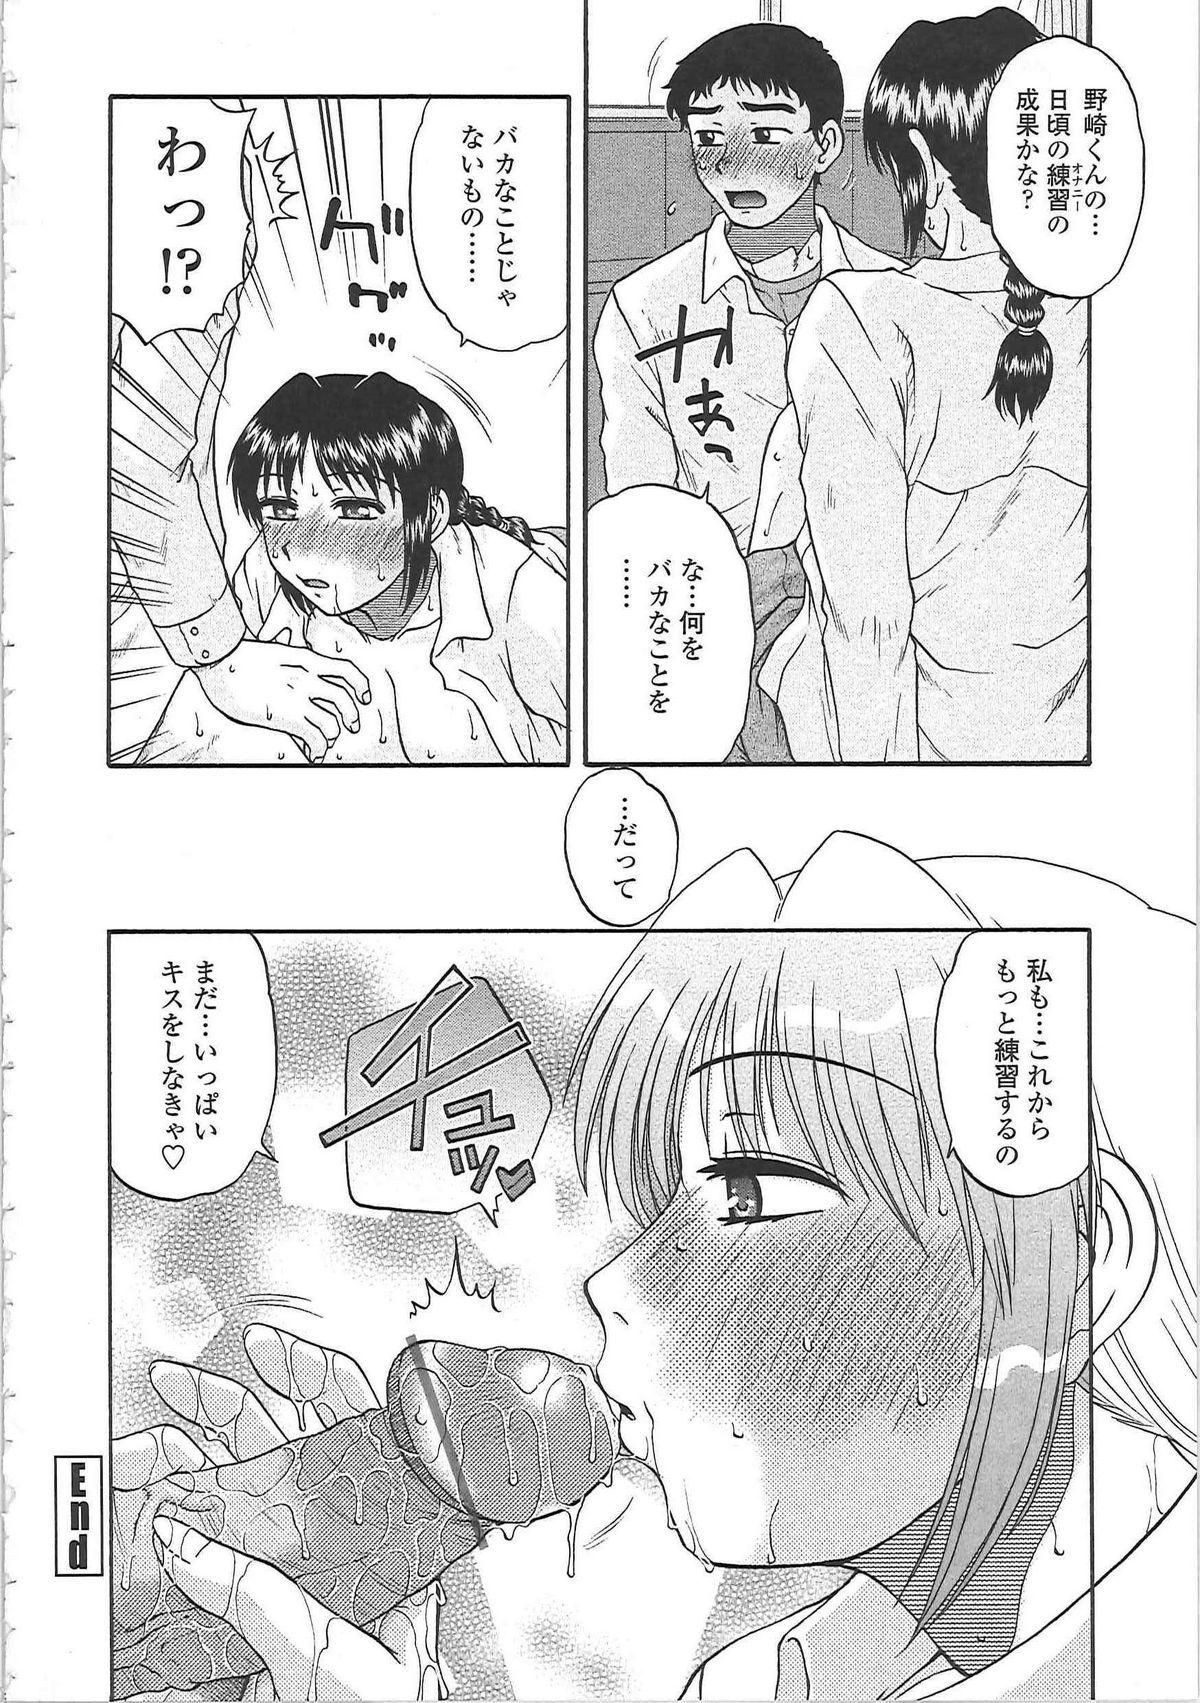 Nikuzuma Tsuushin - Erotic Wife Communication 78